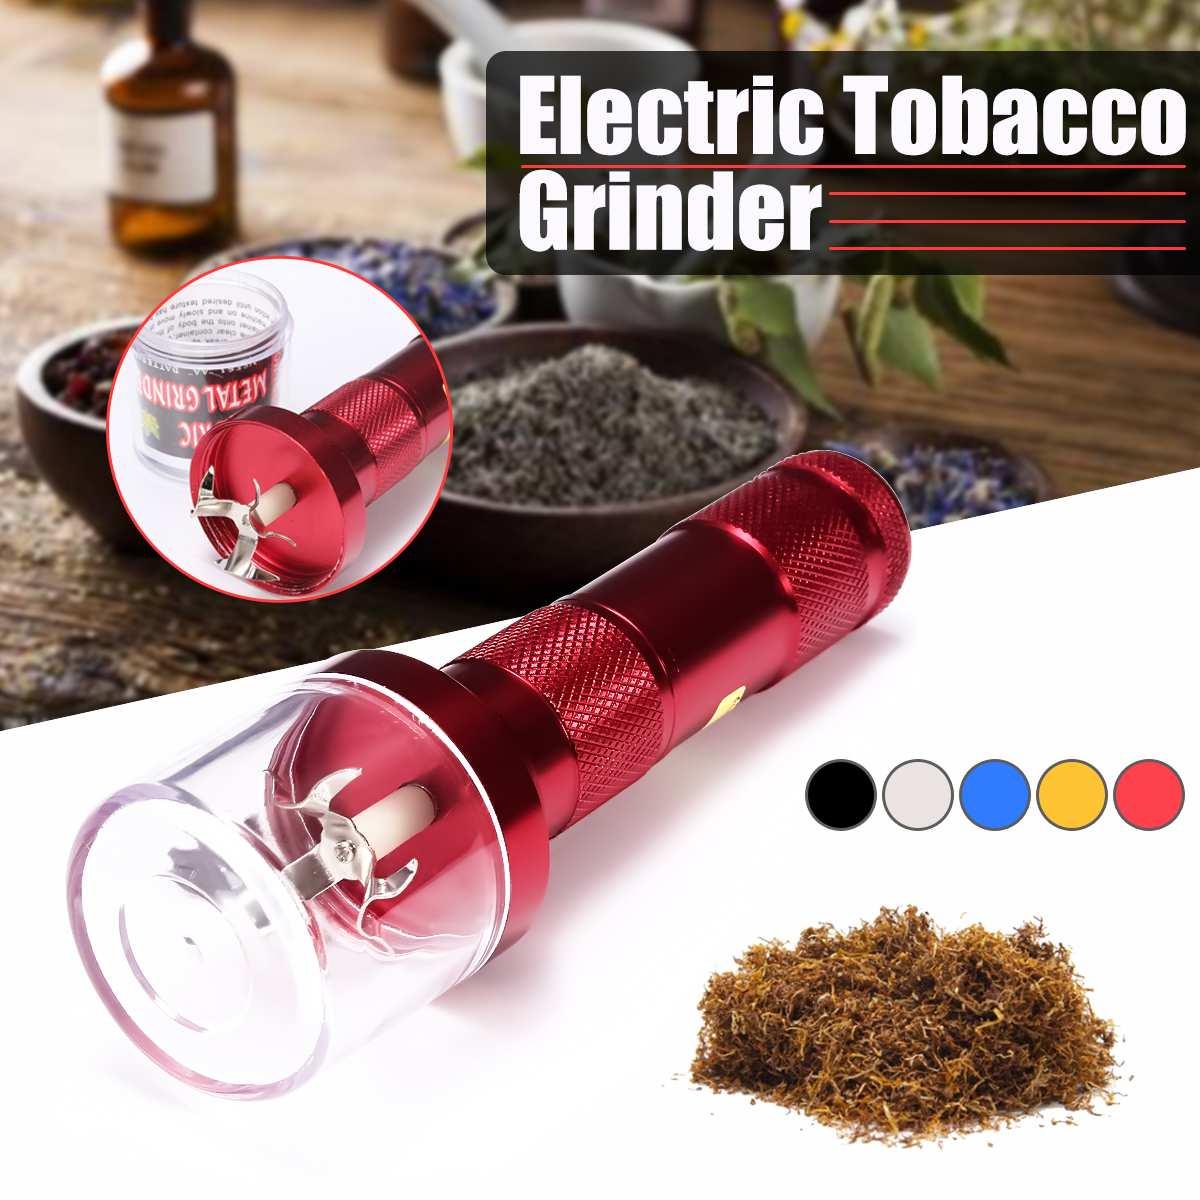 Electric Torch Shape Grinder Crusher Crank Leaf Tobacco Smoke Spice Herb Muller Machine Herb Tobacco Grinder